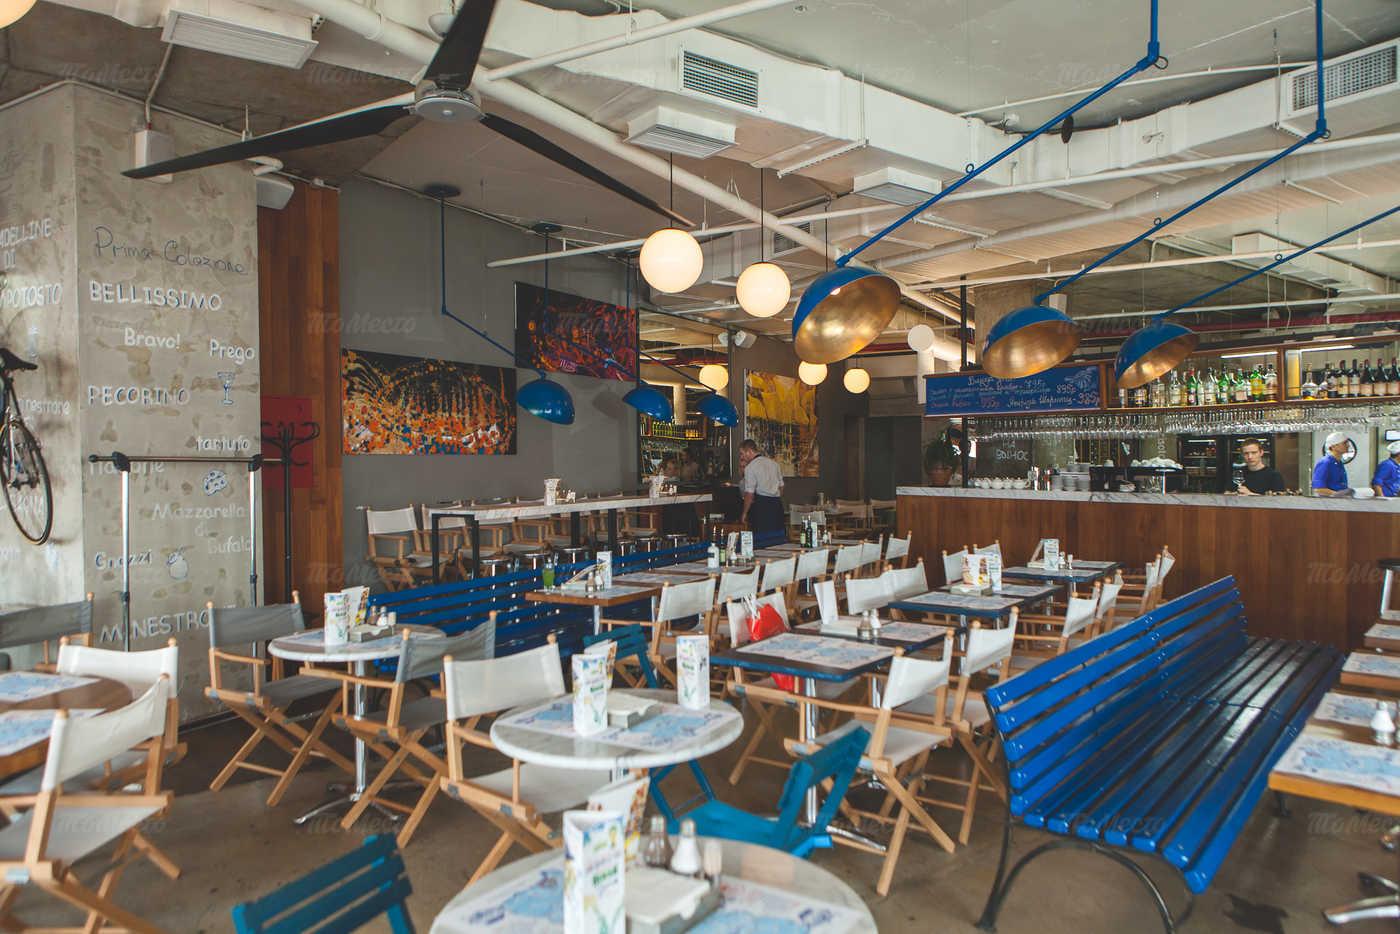 Меню ресторана Ред Пеппер (бывш. Osteria numero Uno) на Цветном бульваре